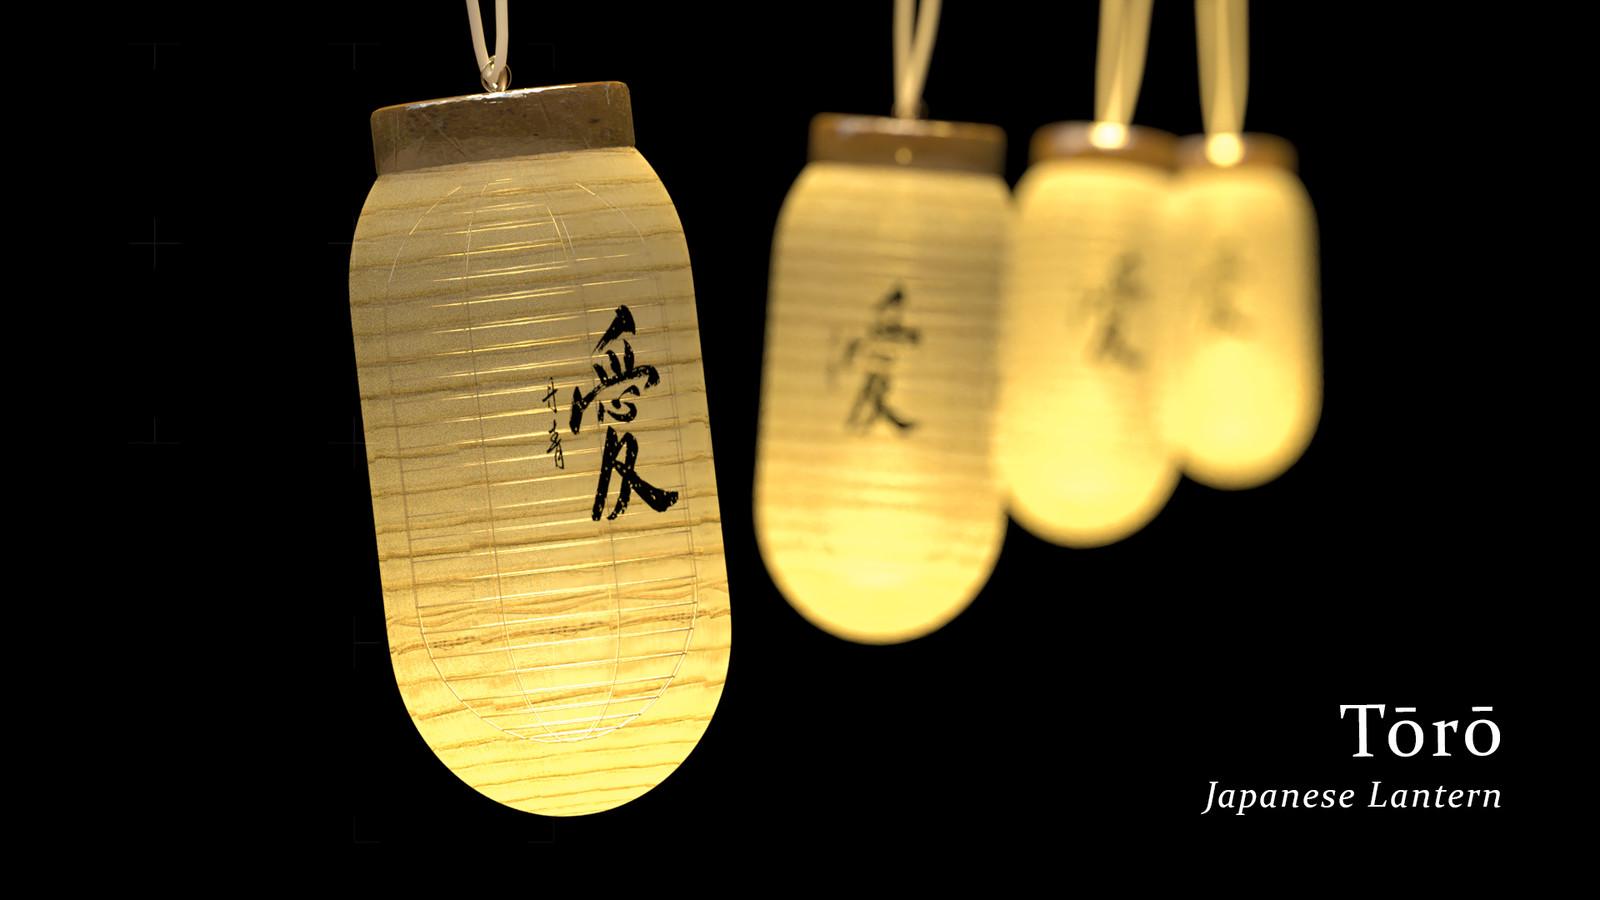 Japanese Lantern / Tōrō - Final Render